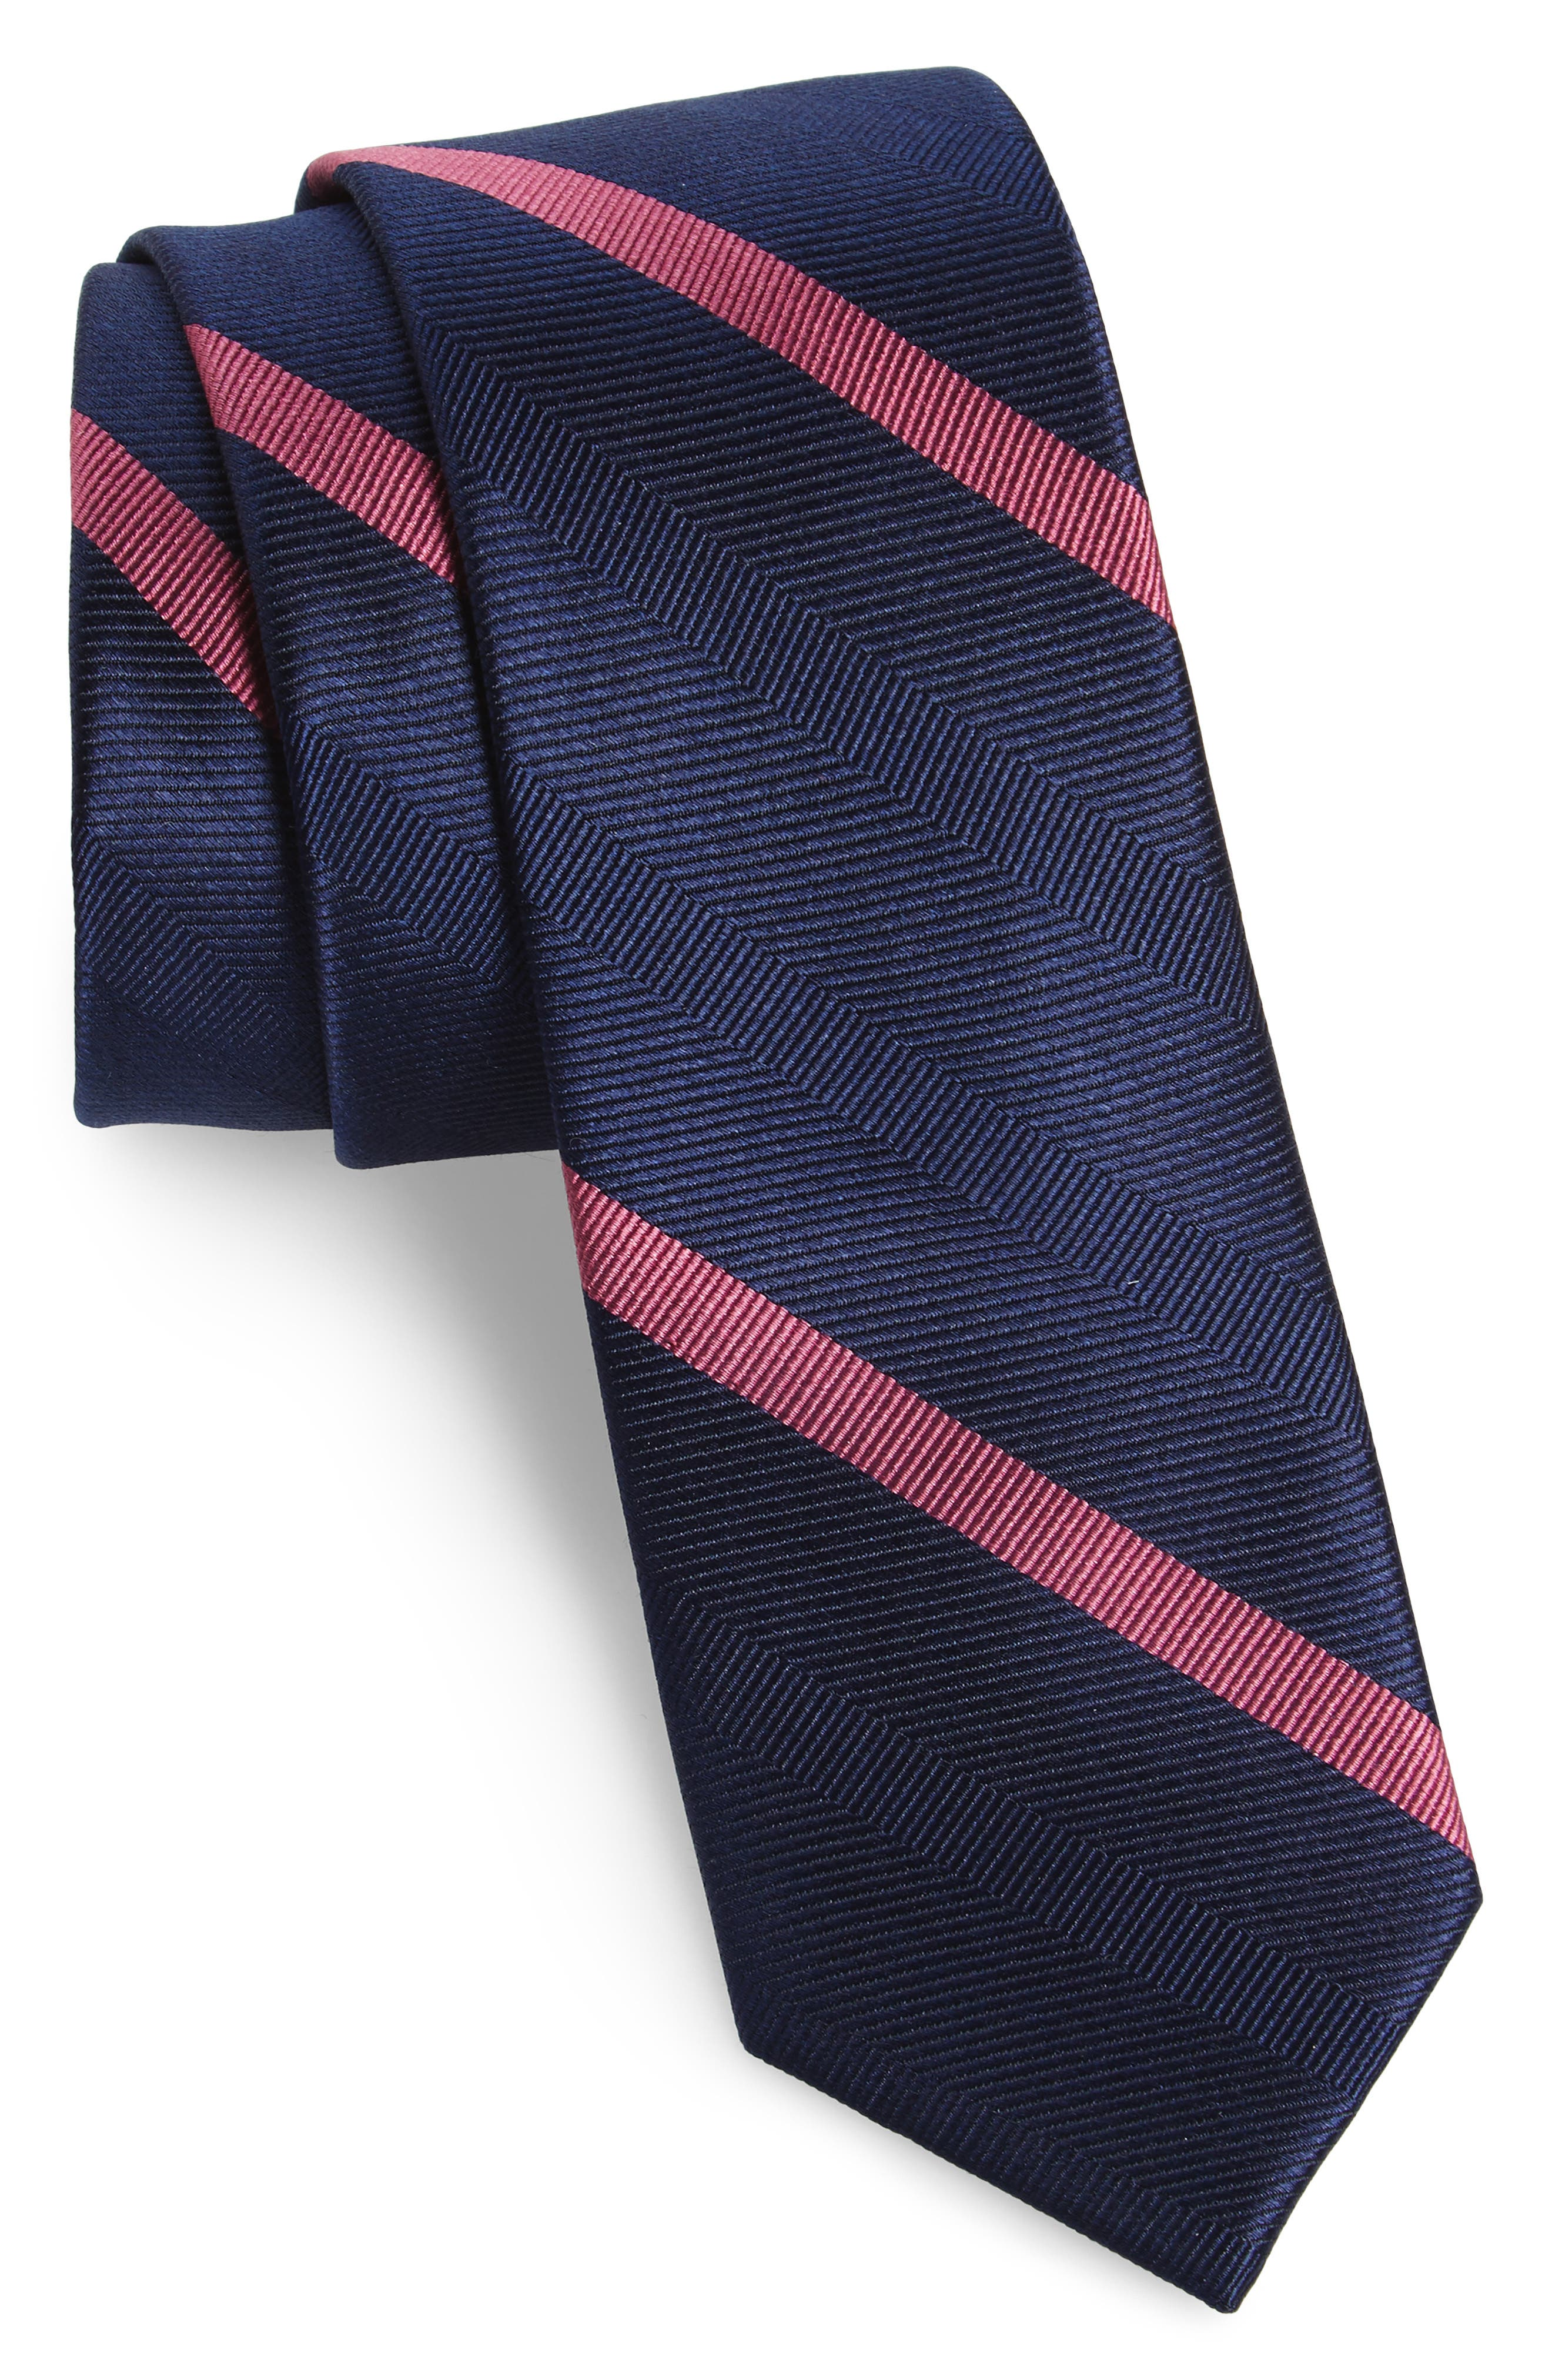 Goal Line Stripe Silk Skinny Tie,                             Main thumbnail 1, color,                             410